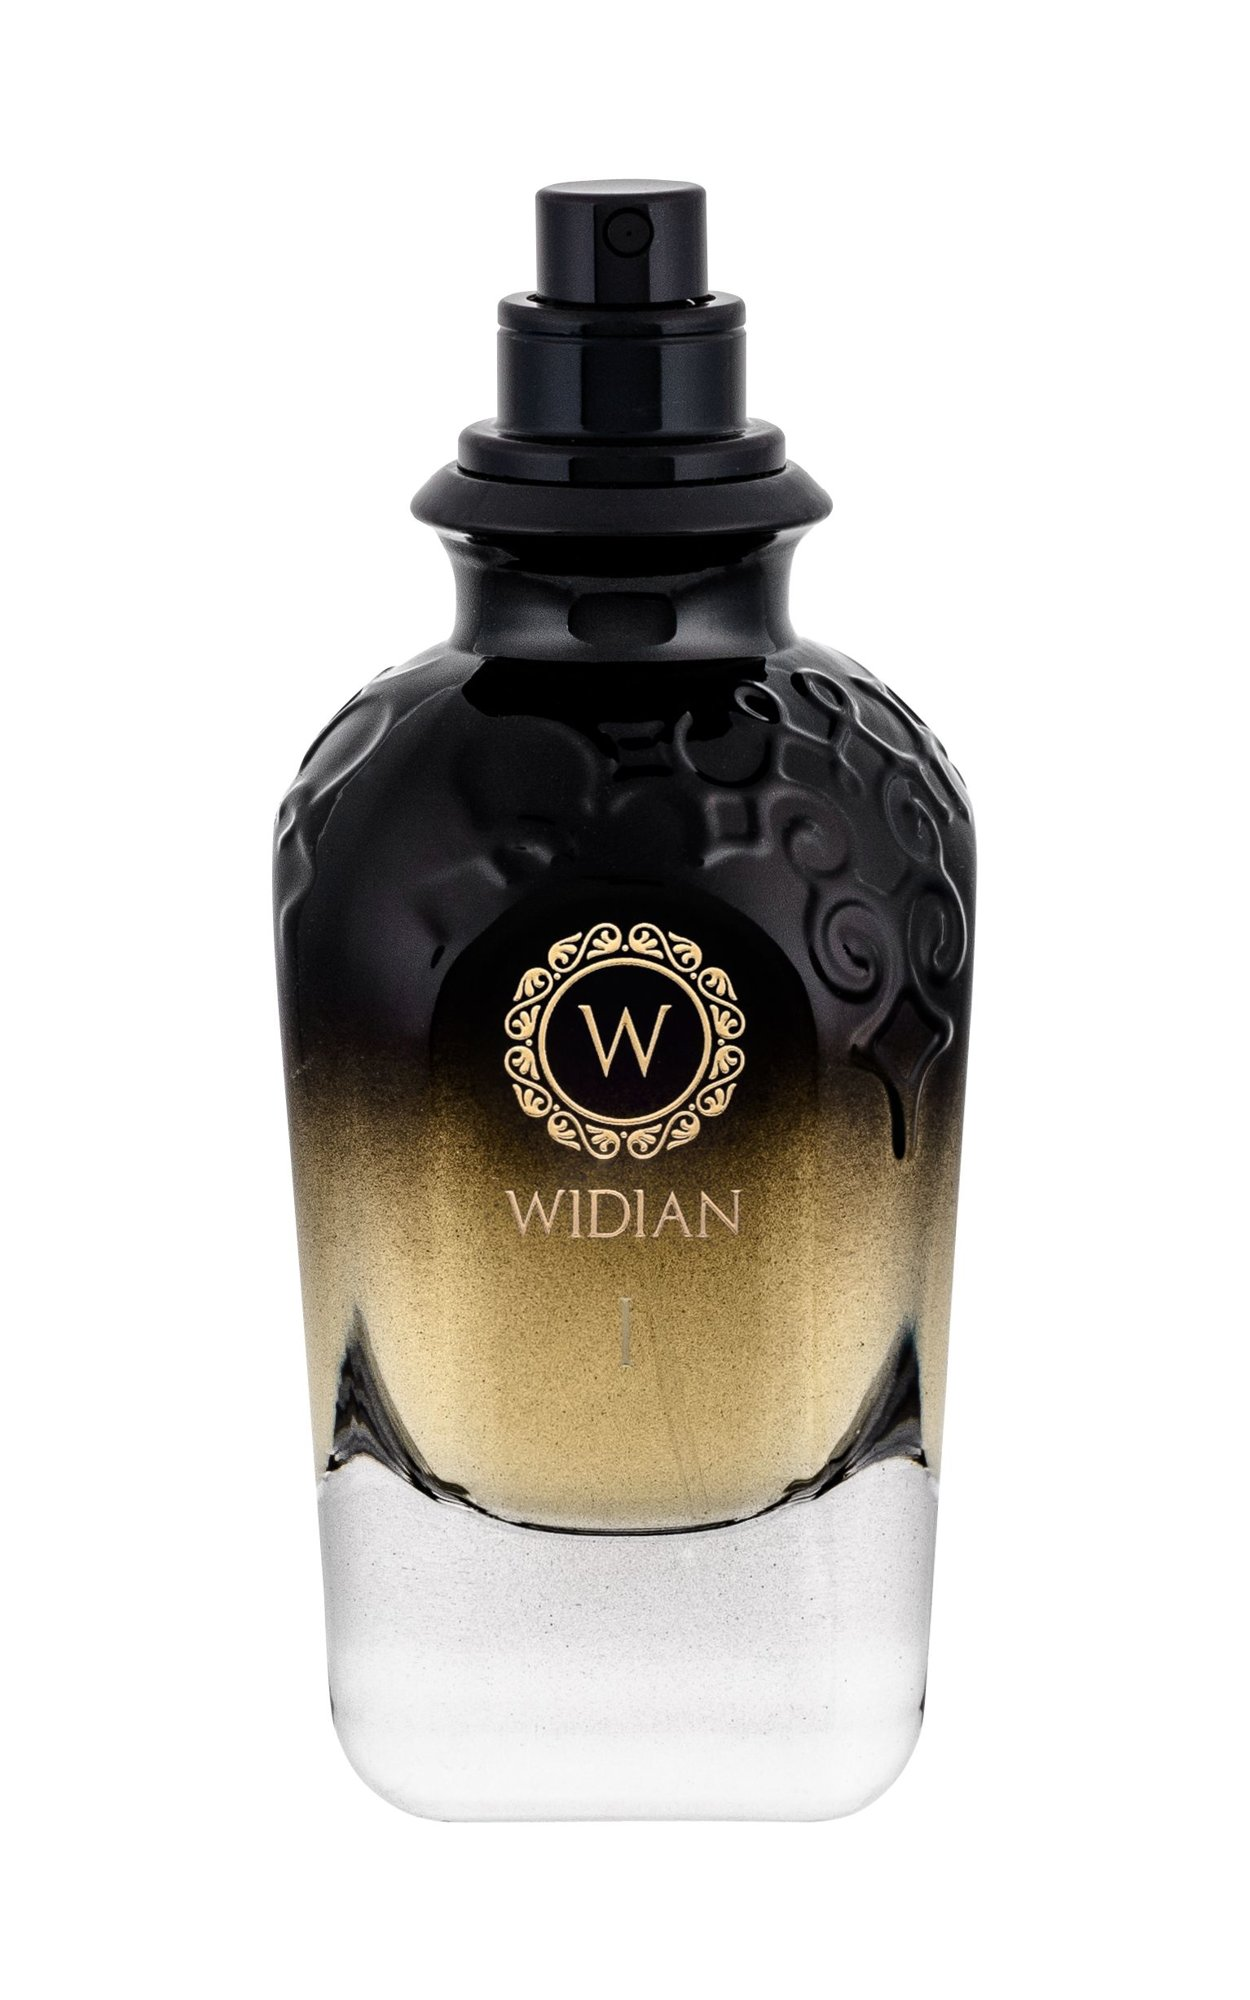 Widian Aj Arabia Black Collection I Perfume 50ml